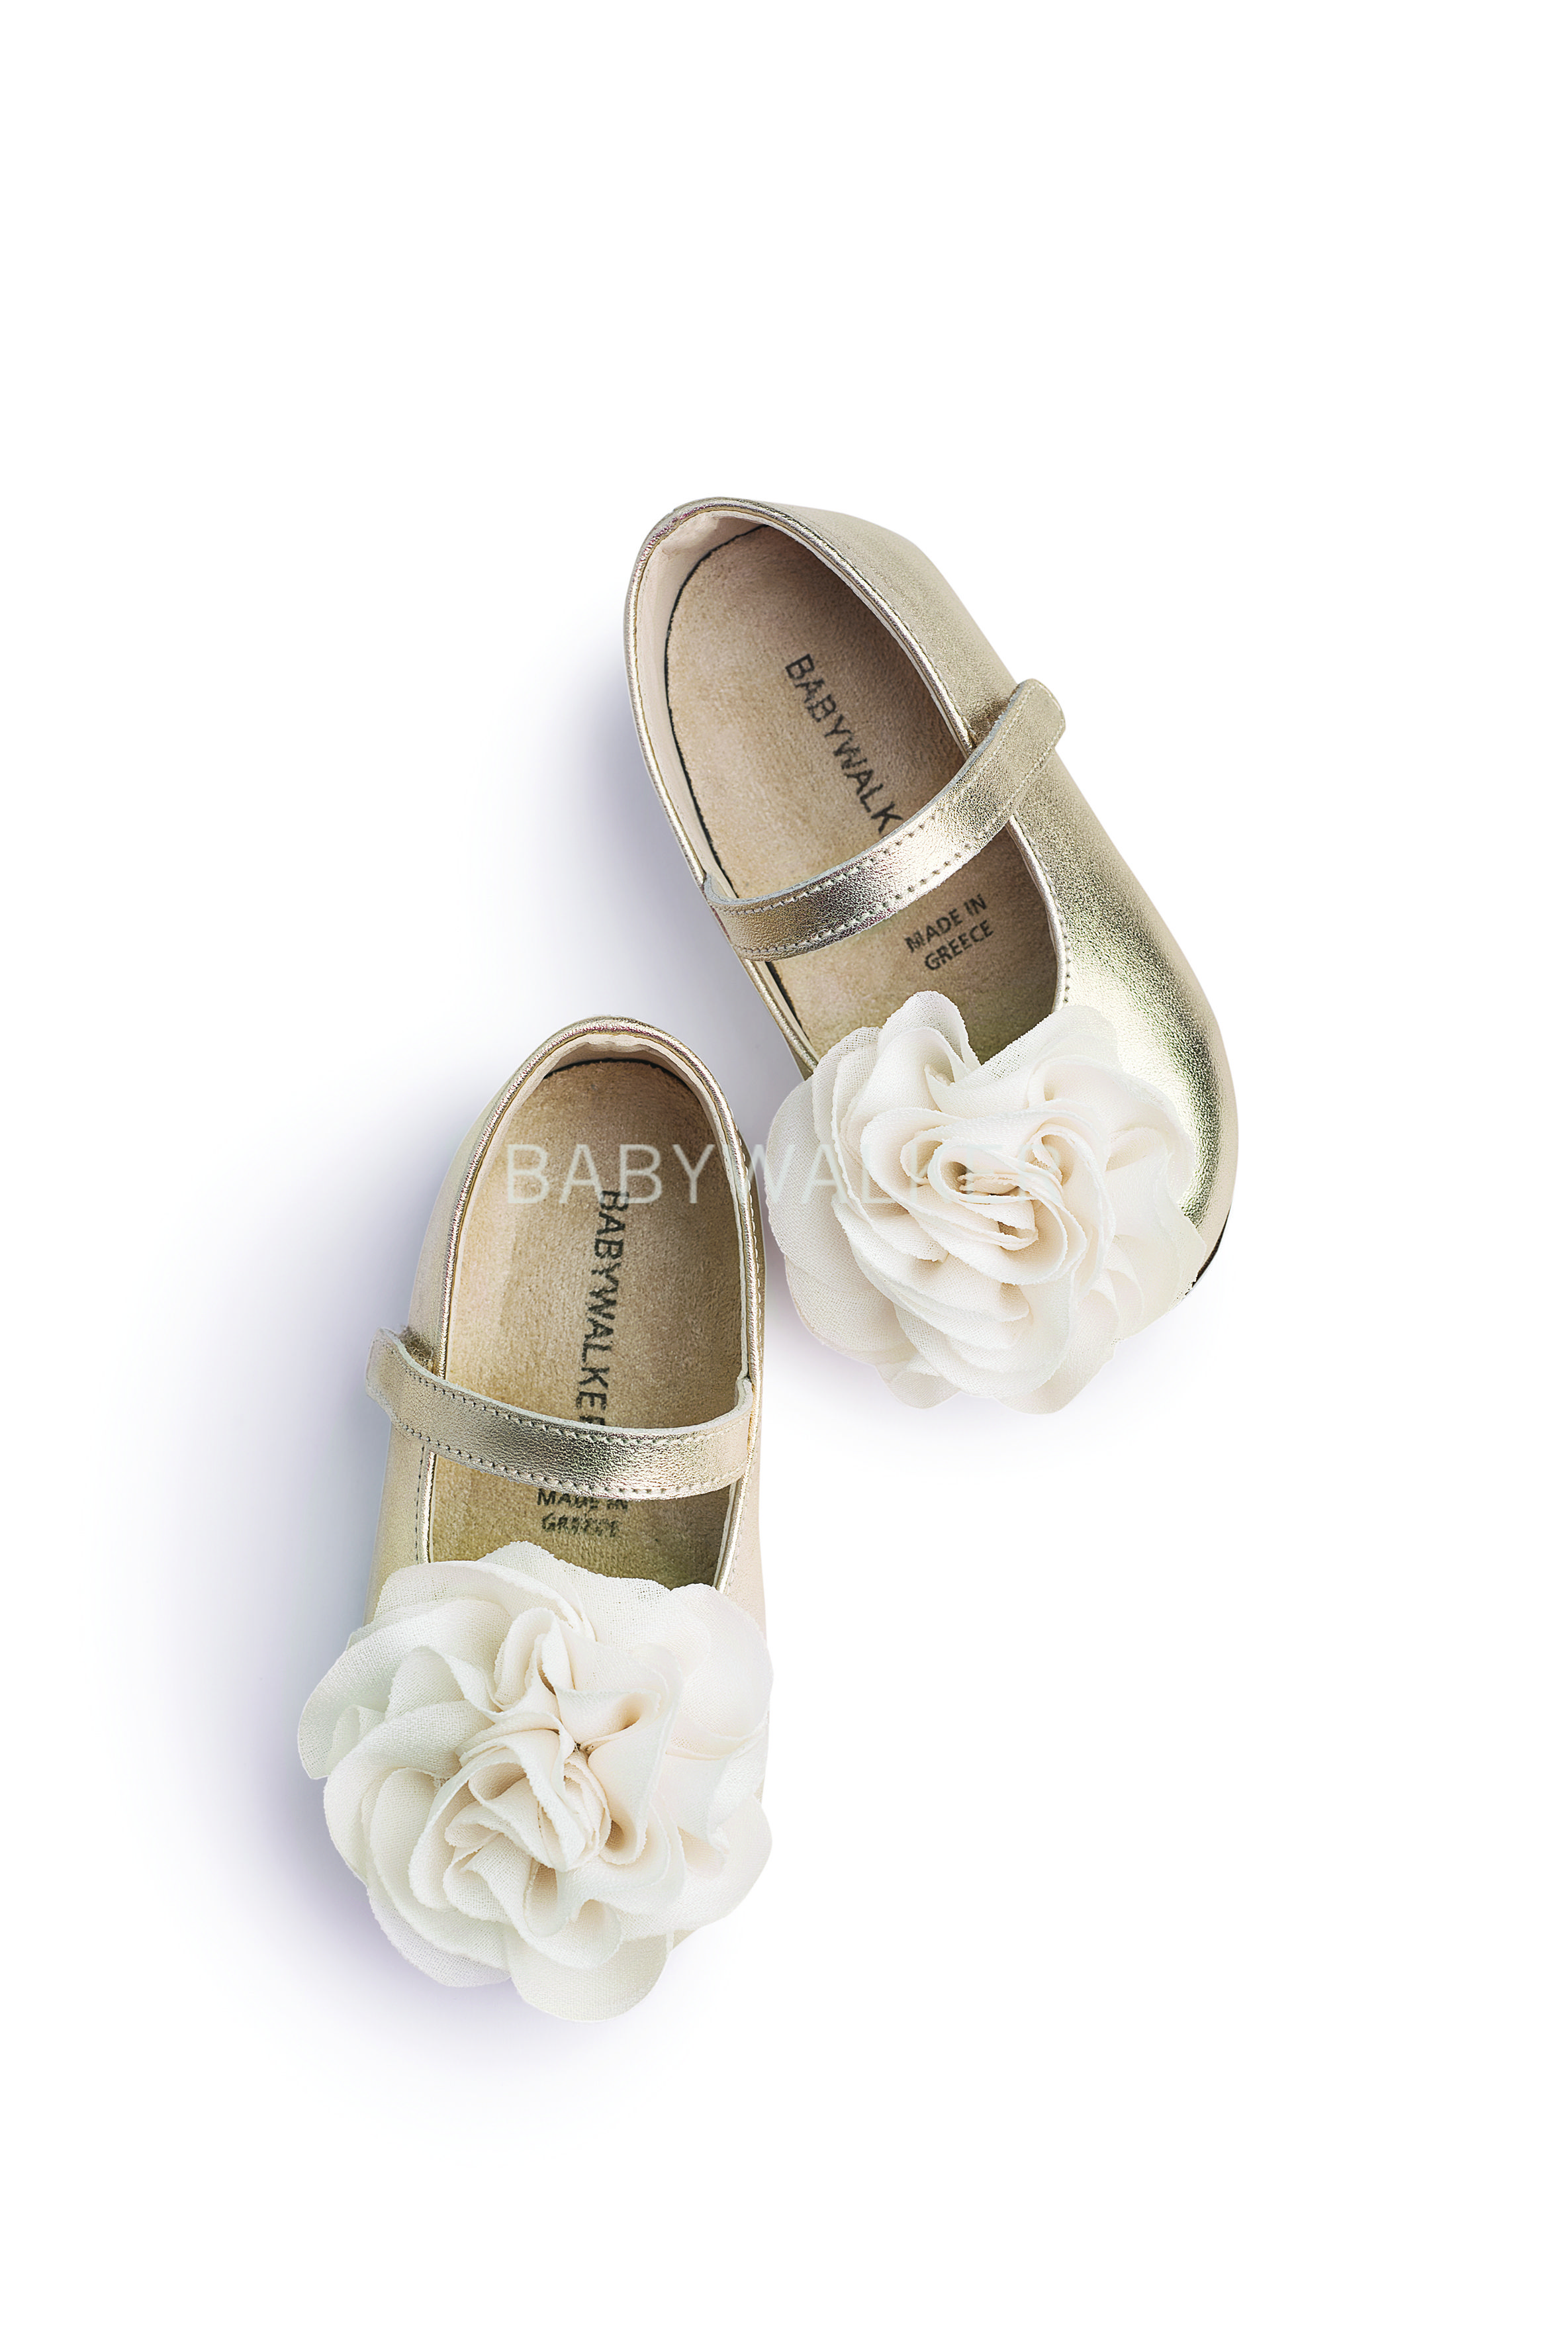 f2c17ab1d3a Βαπτιστικό παπούτσι Babywalker για κορίτσι από δέρμα μεταλιζε σε χρυσό Mary  Janes, Βρεφικά Παπούτσια